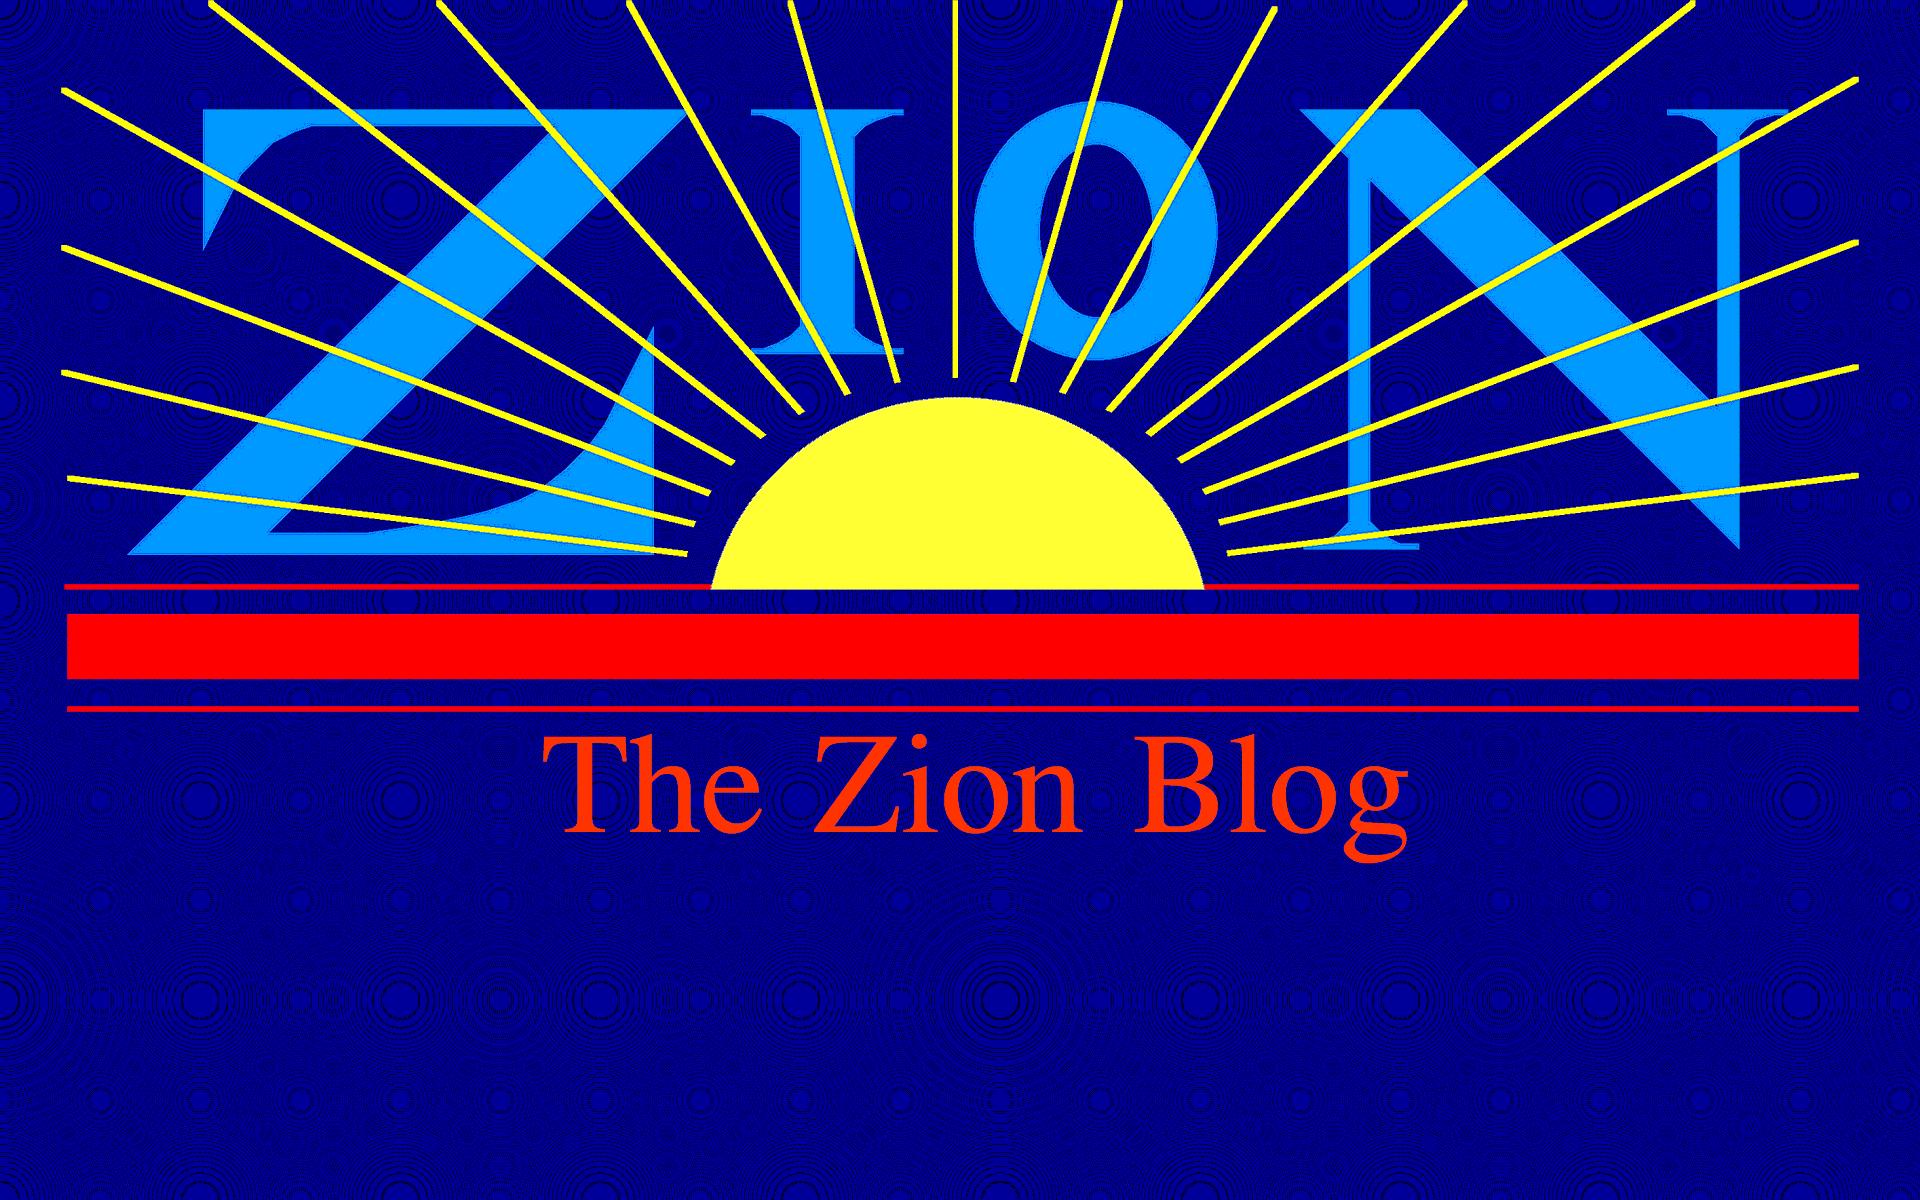 Jay Mackley LDS Zion blog